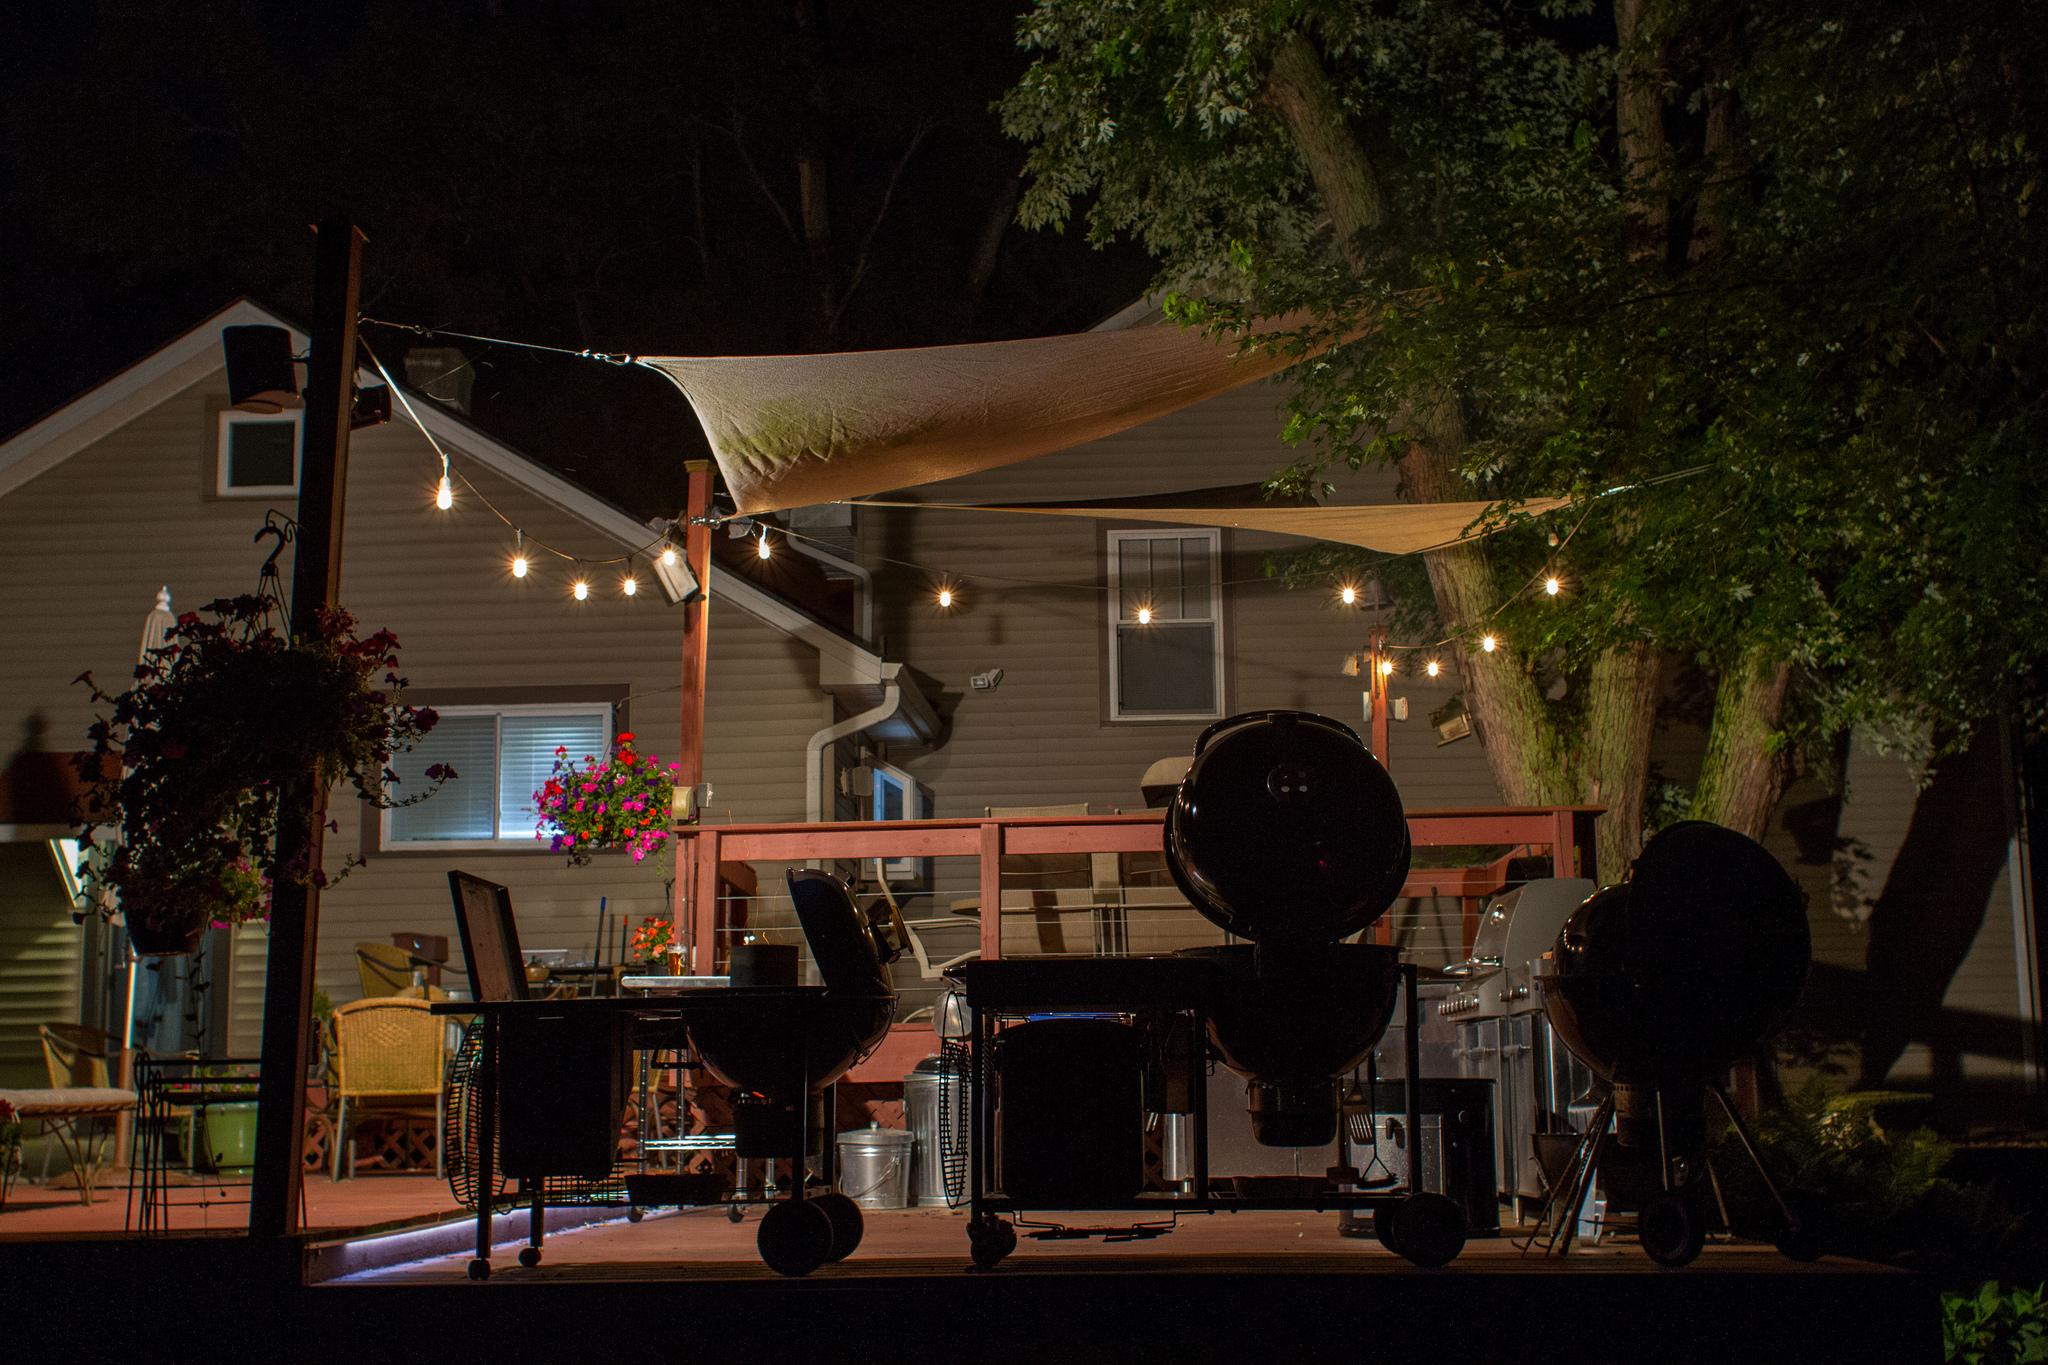 grill deck lit up at night.jpg